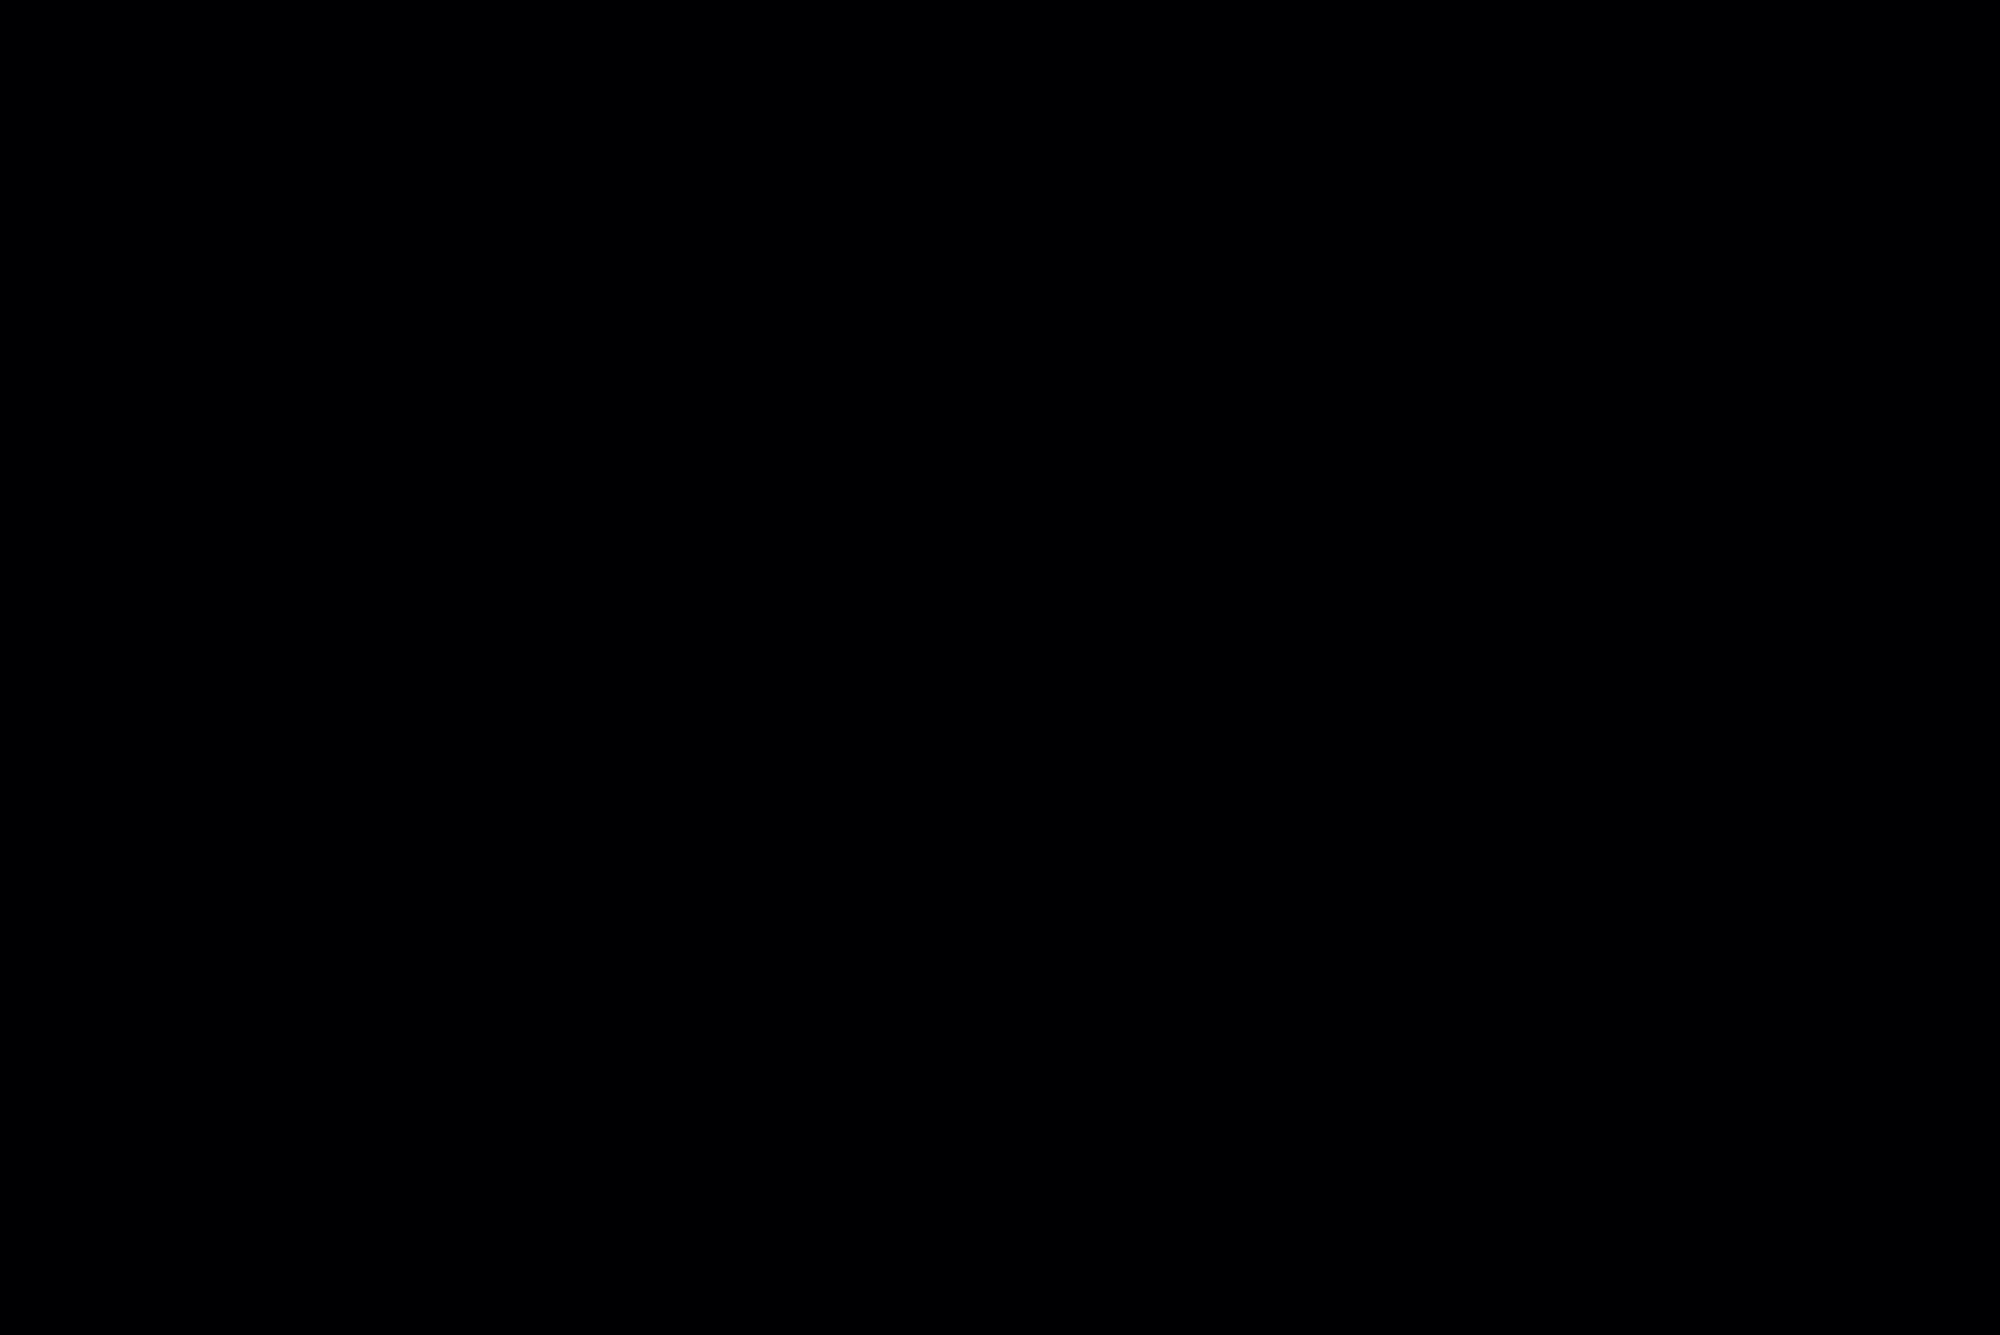 SA1 2380